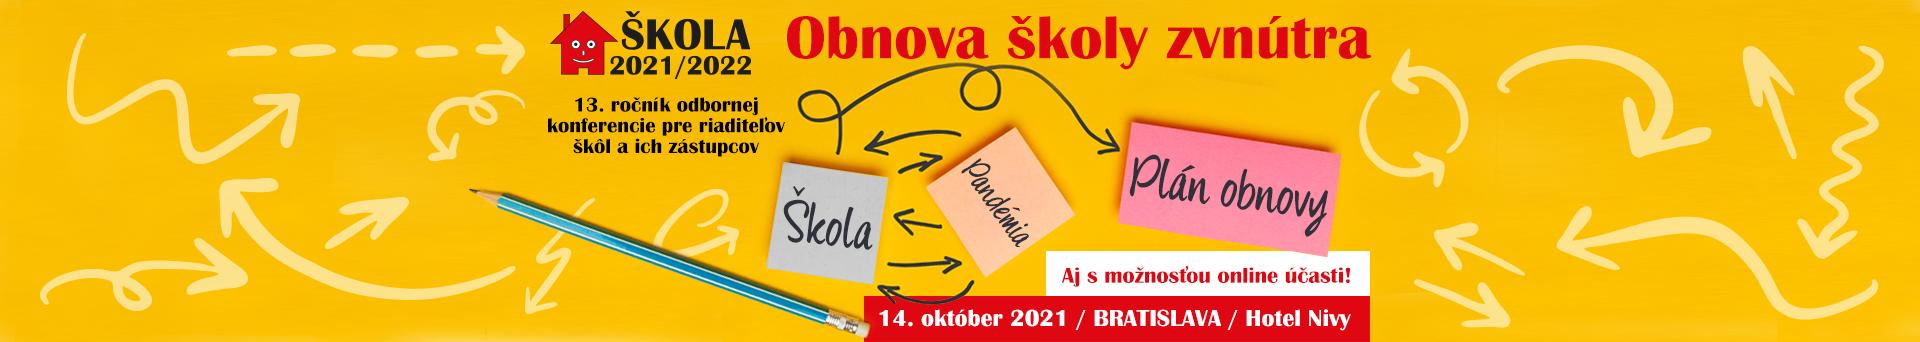 ŠKOLA 2021/2022